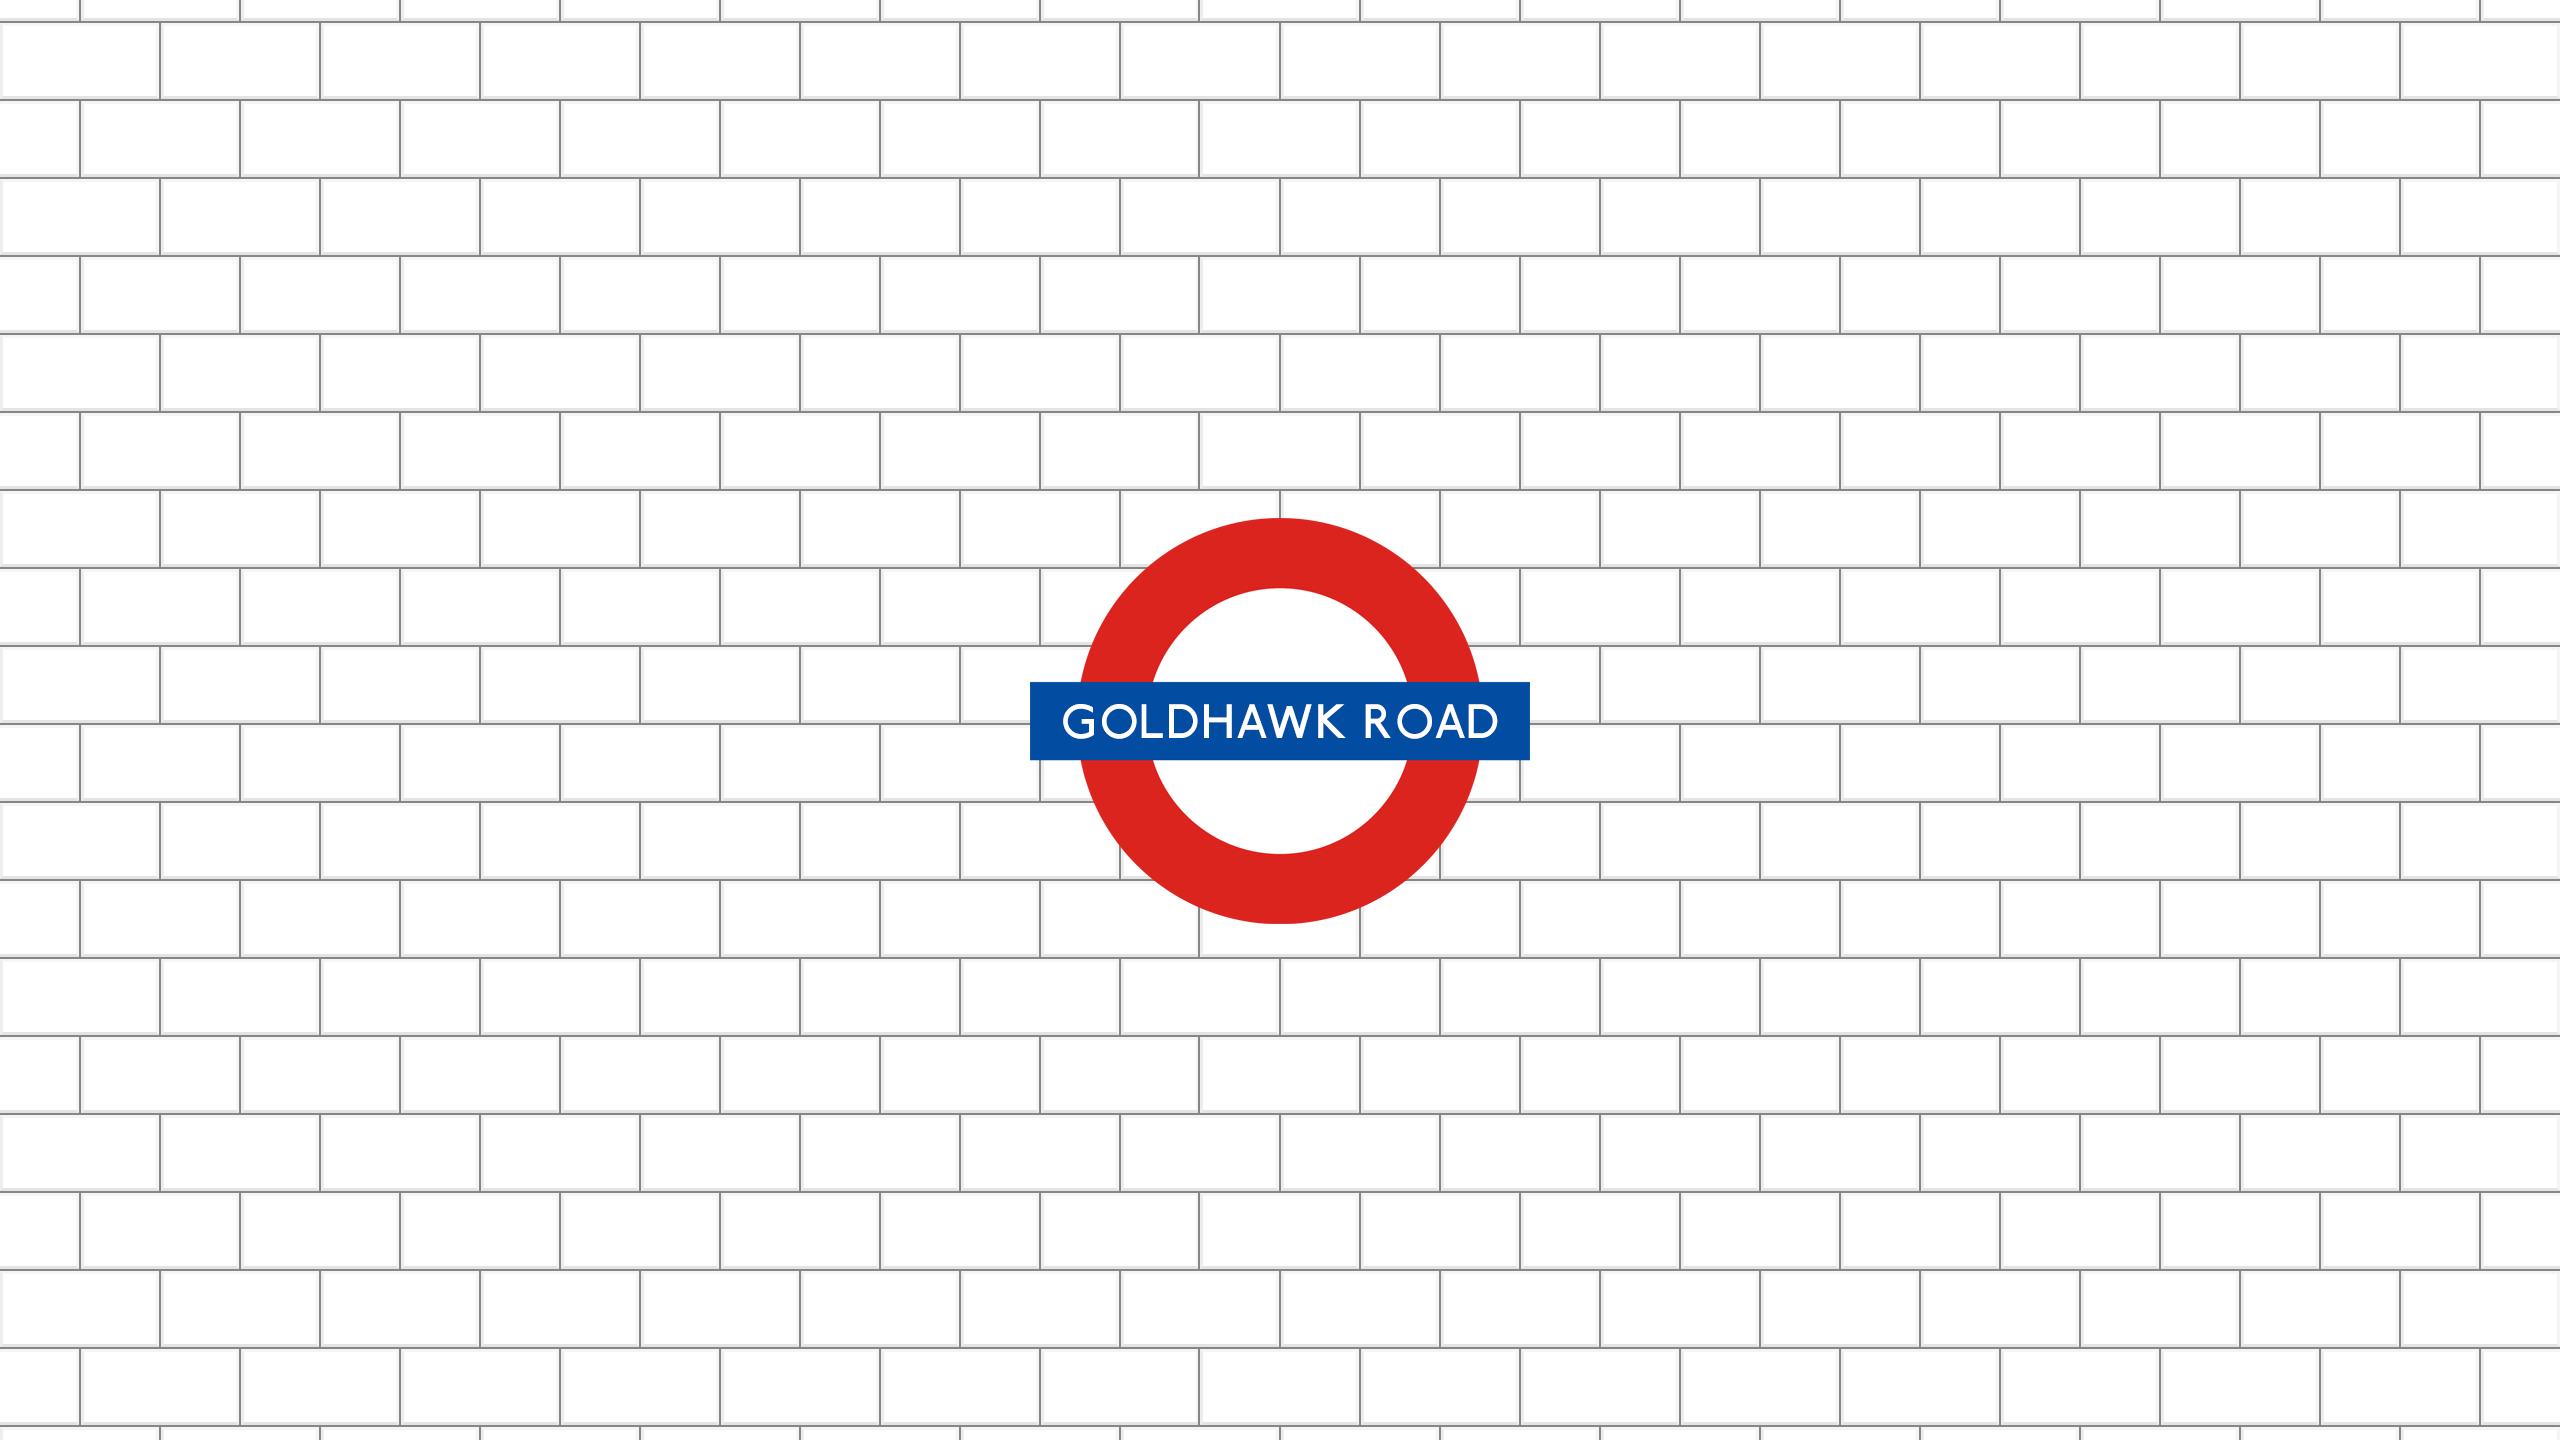 Goldhawk Road